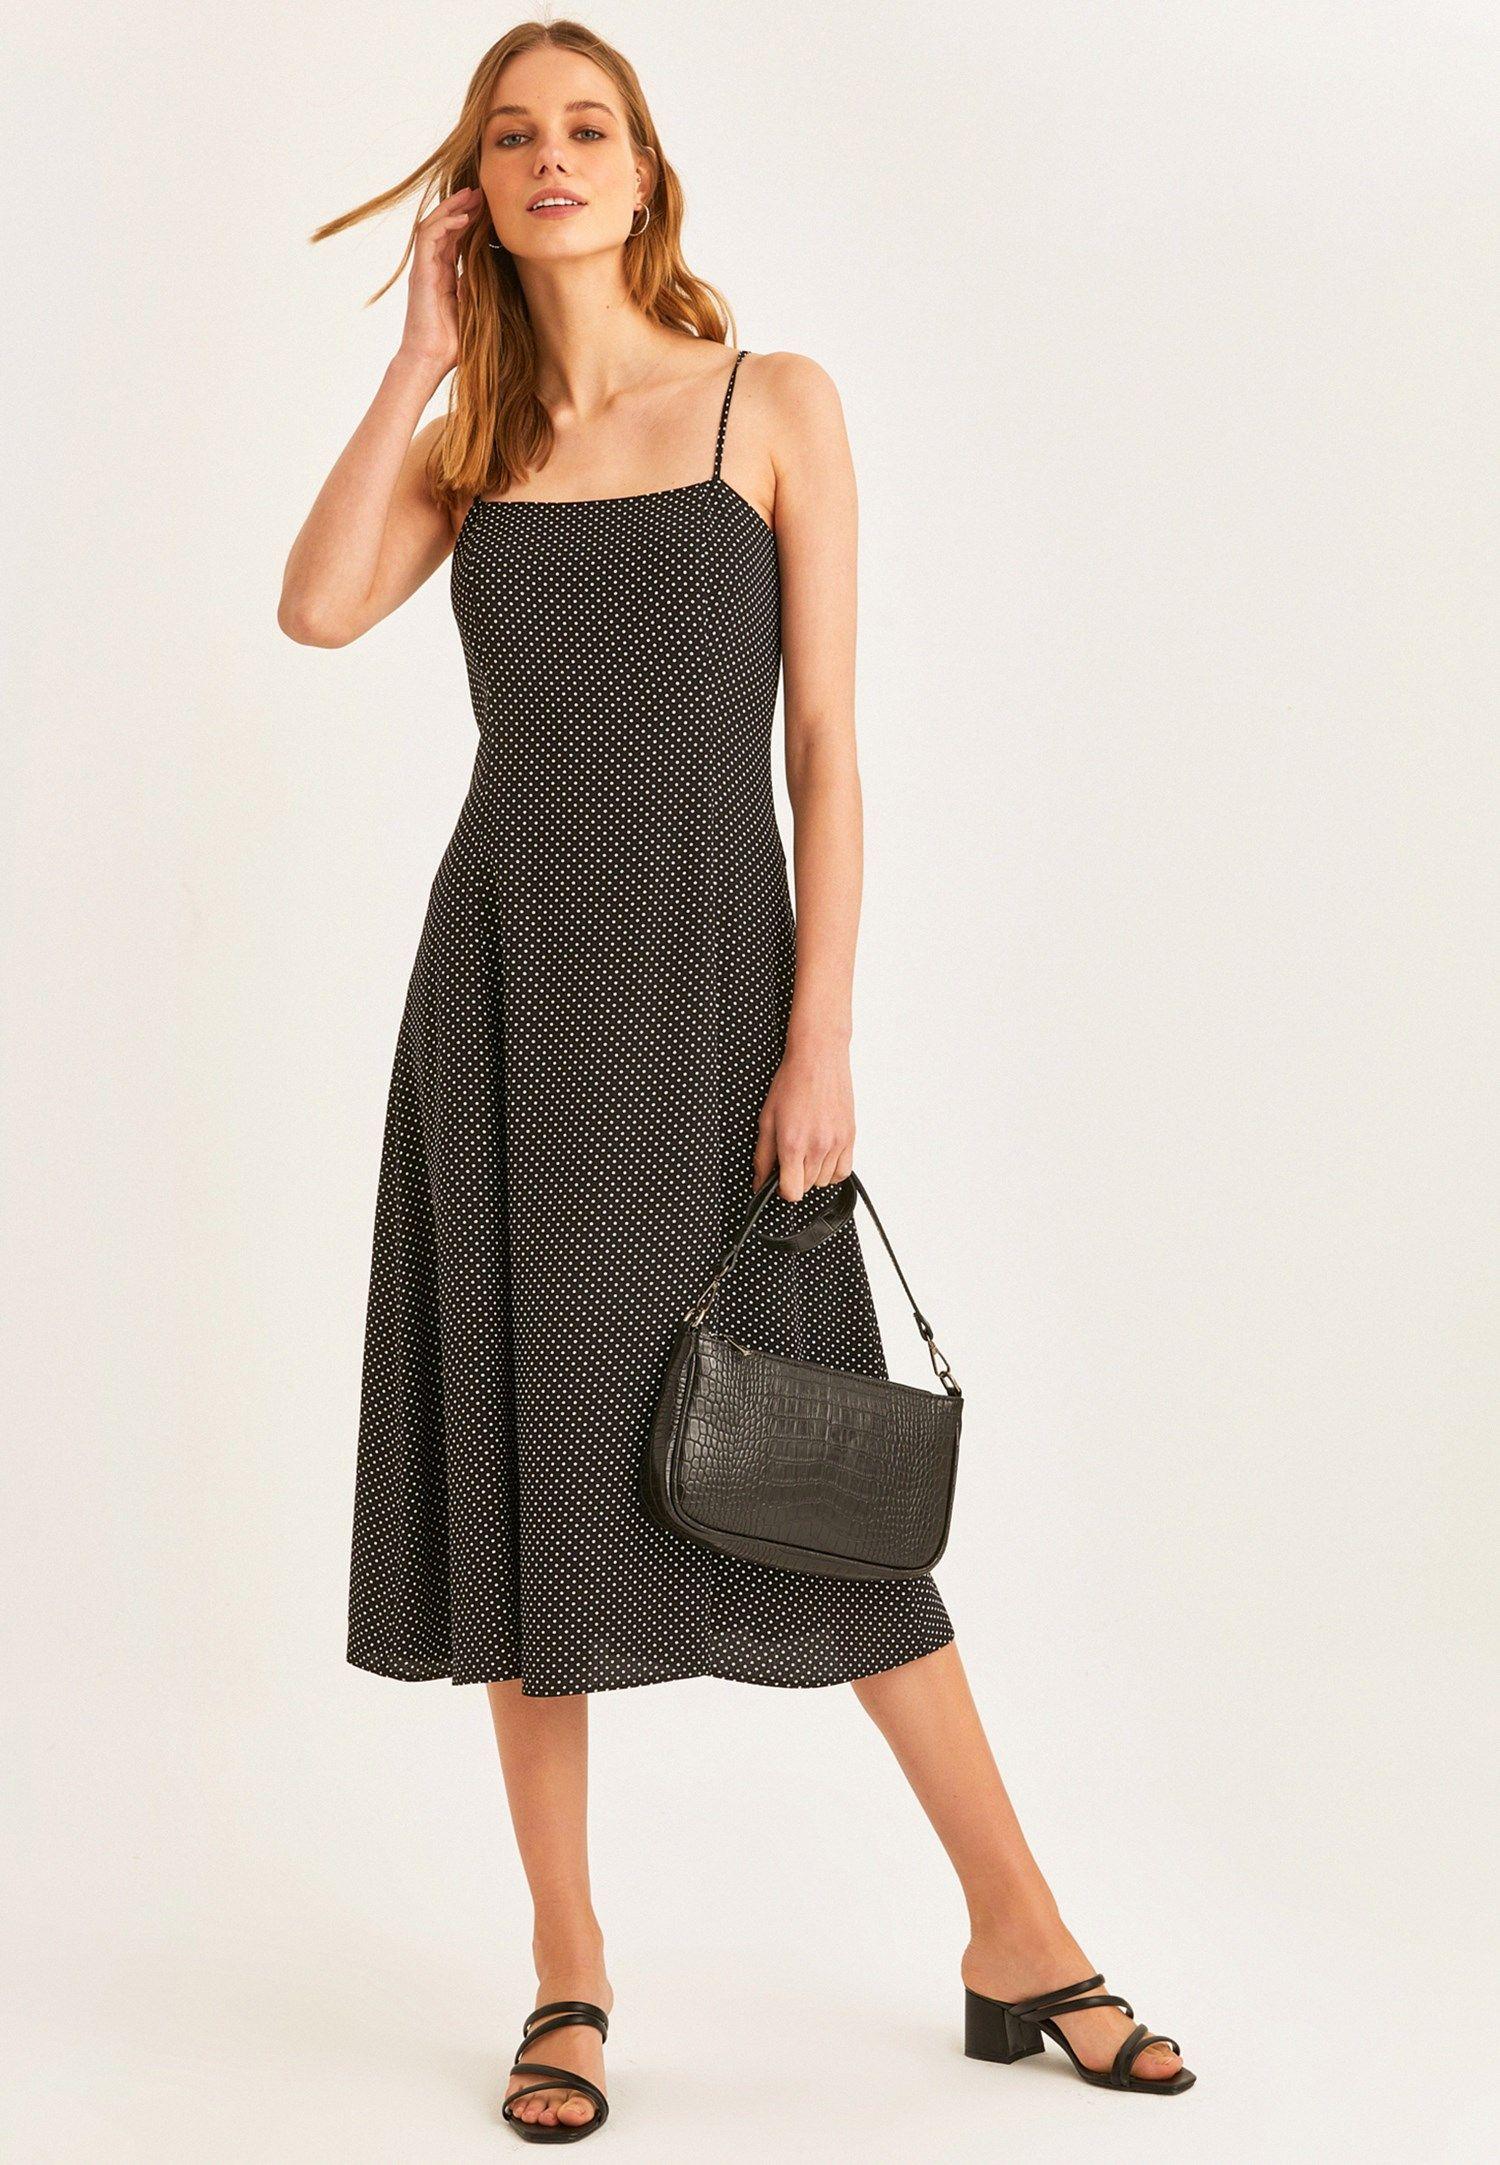 Siyah Puantiyeli Midi Boy Elbise Online Alisveris 20yox Visasdes Oxxo 2020 Elbise Midi Elbise The Dress